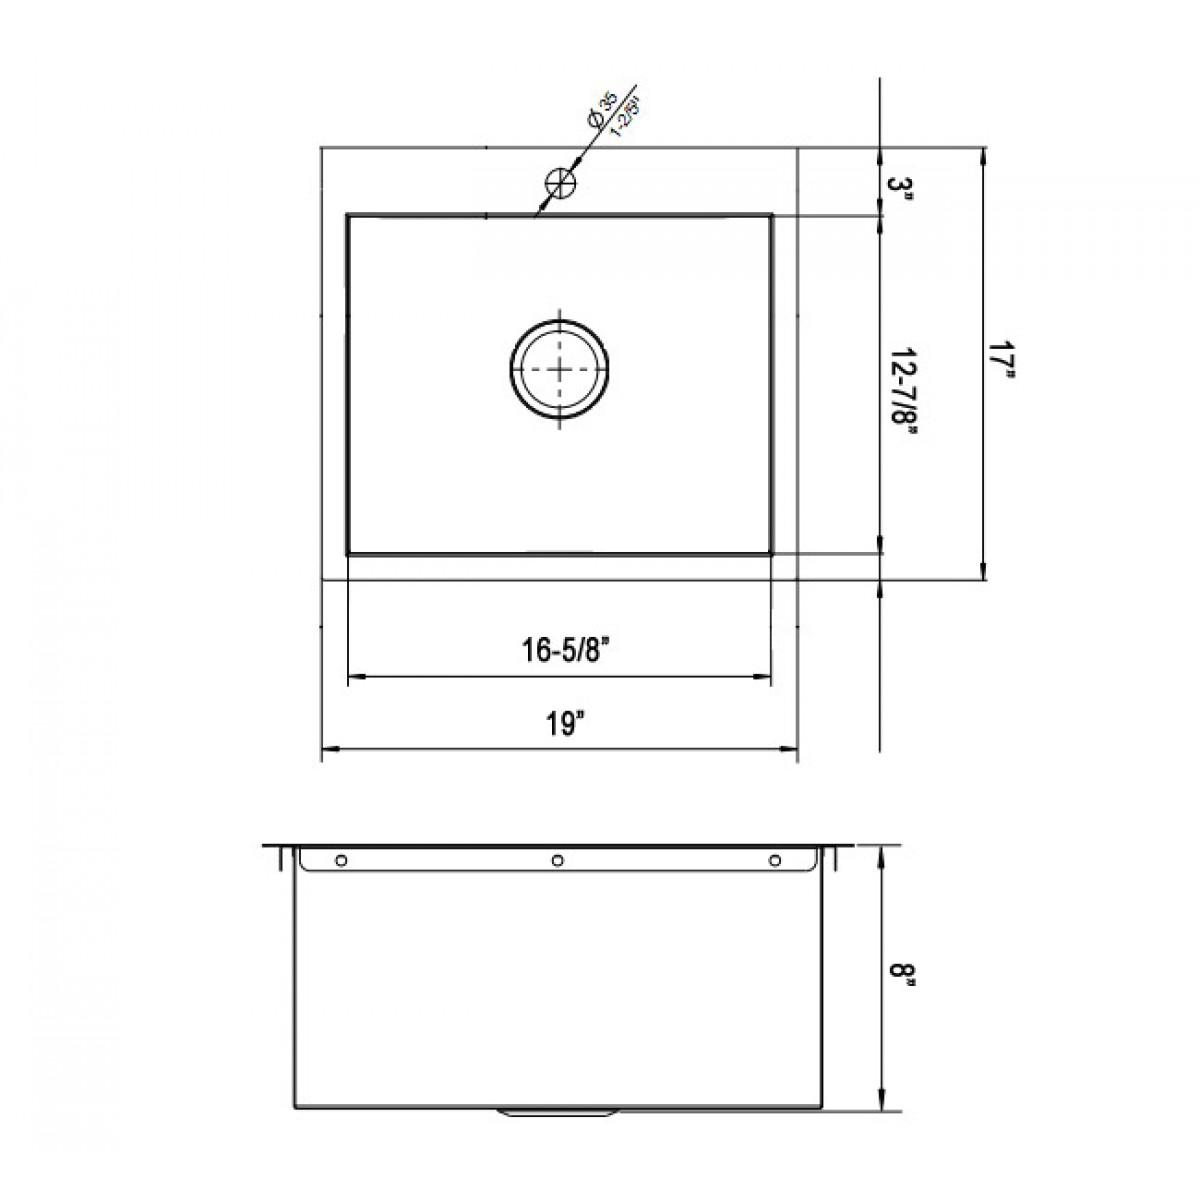 Kitchen Island With Sink Dimensions: 19 Inch Top-Mount / Drop-In Stainless Steel Single Bowl Kitchen Island / Bar Sink Zero Radius Design